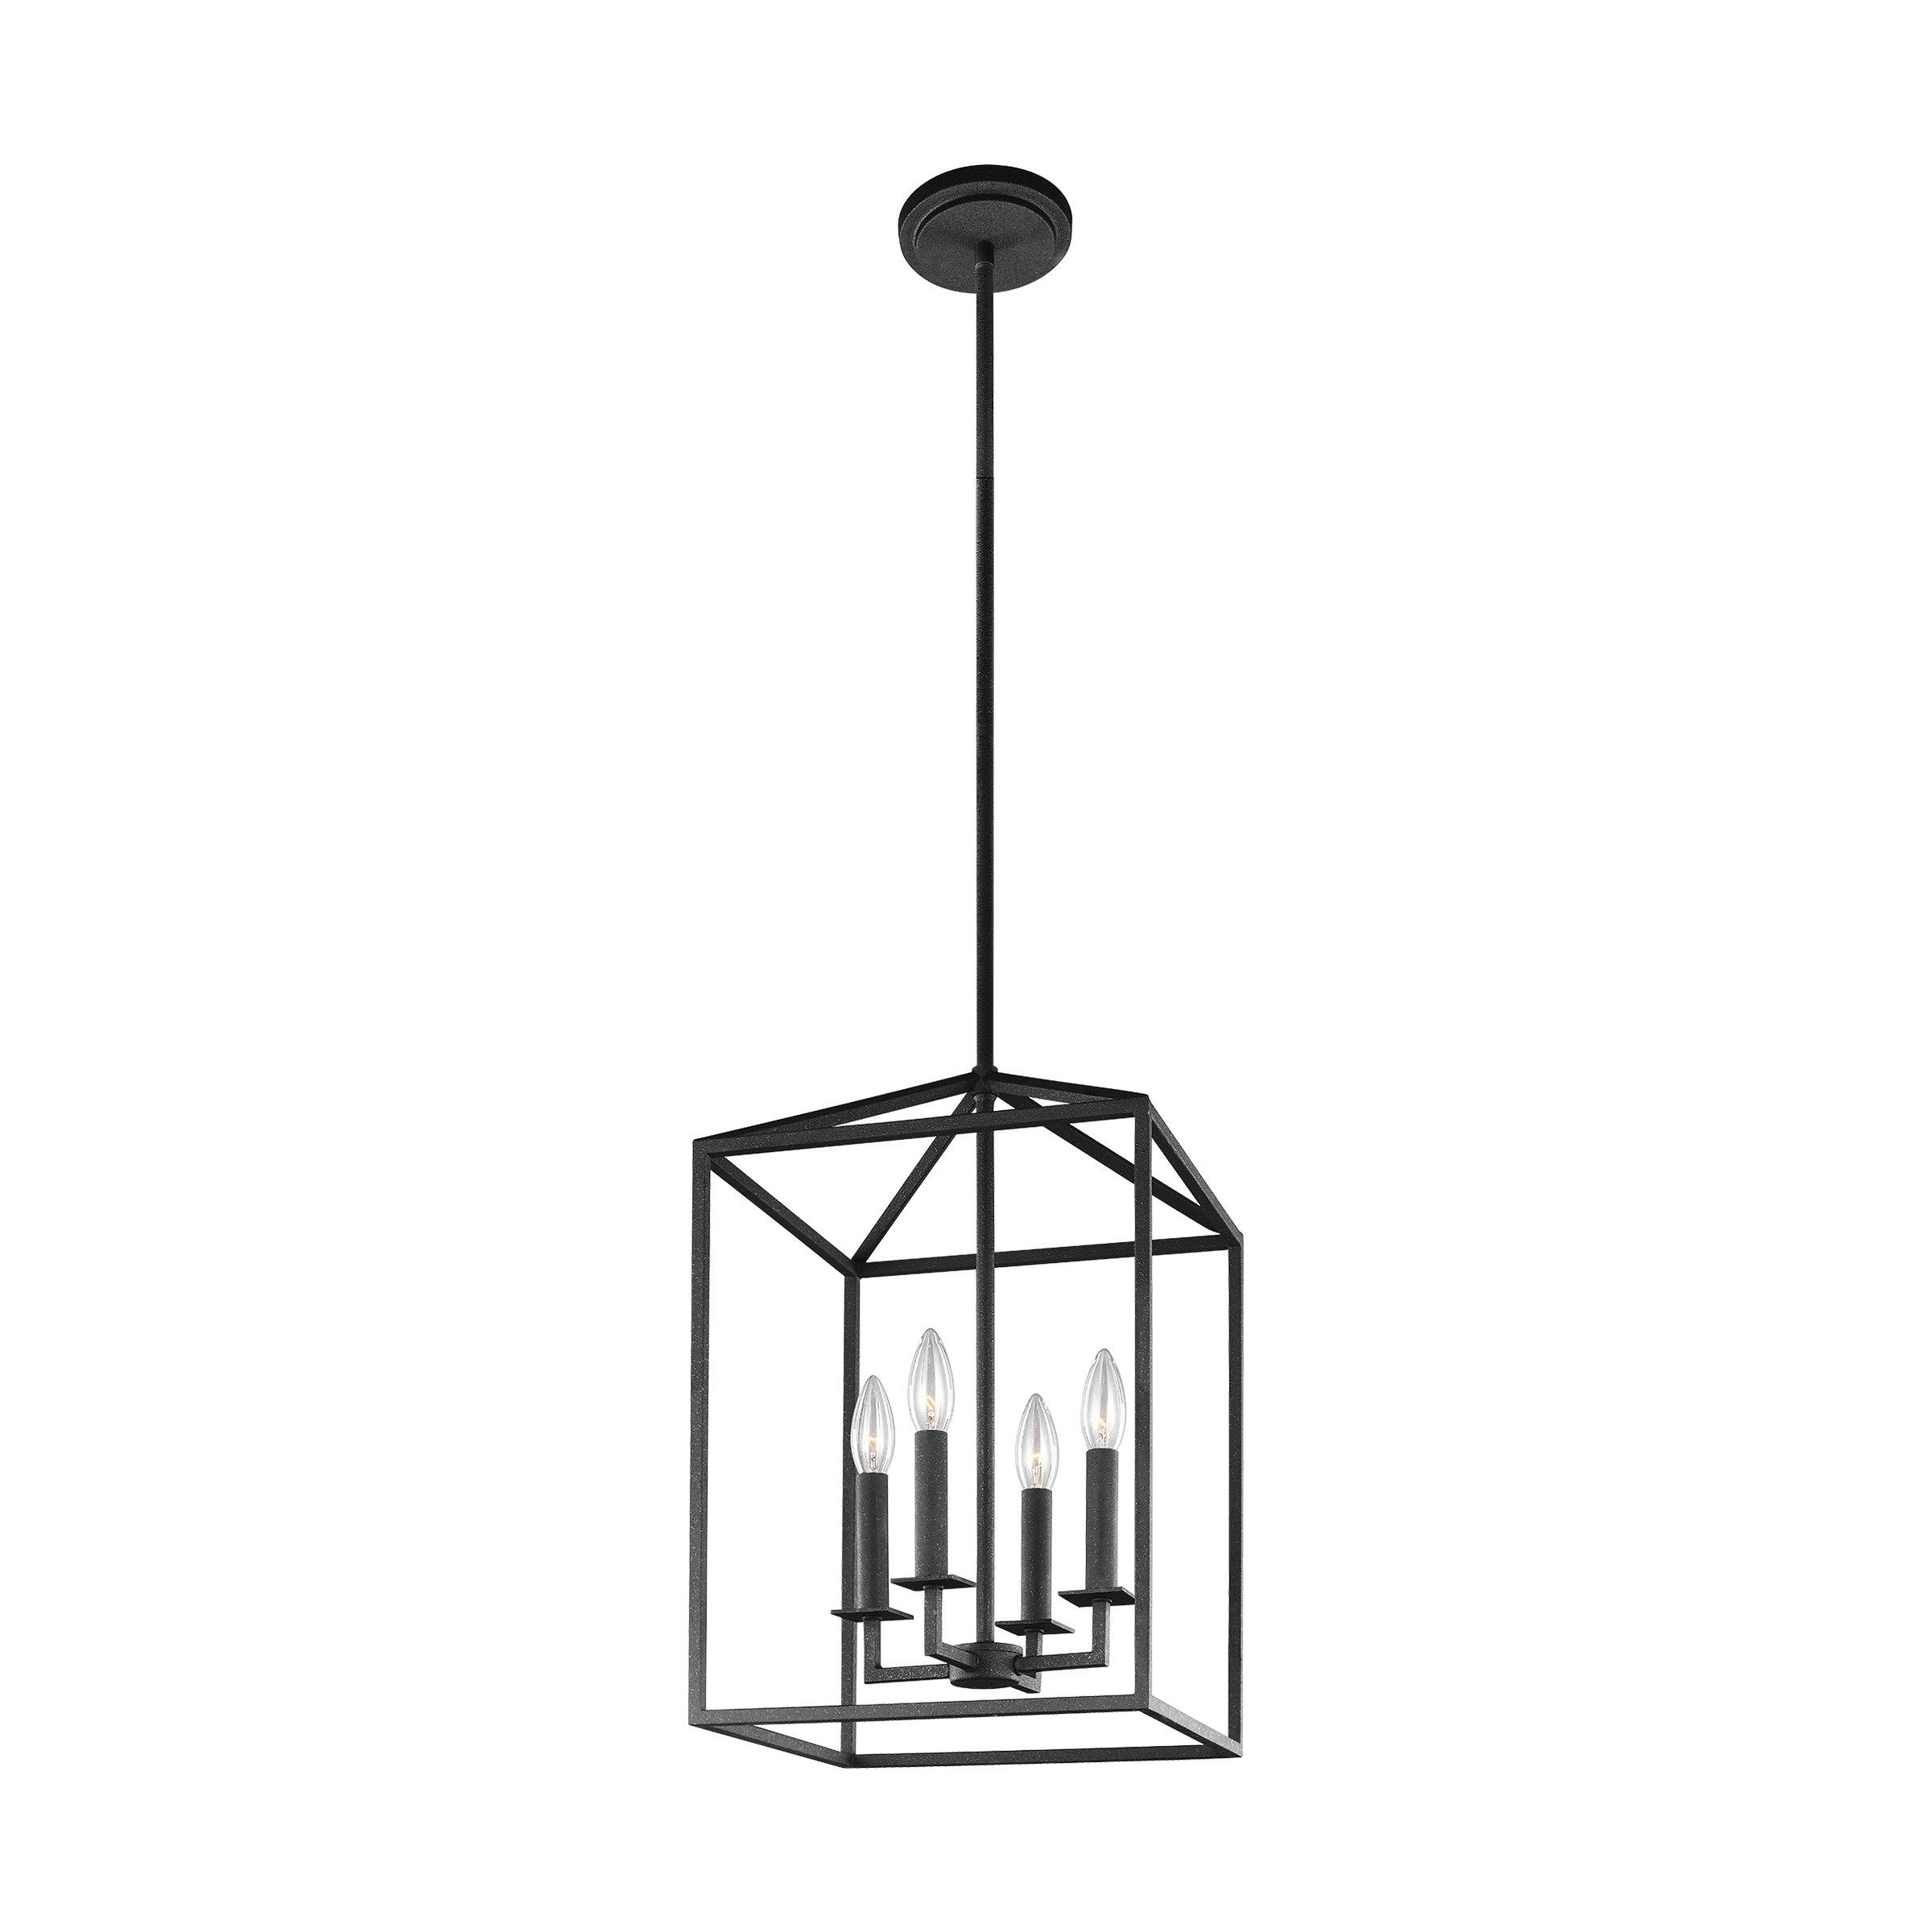 Odie 4 Light Lantern Square / Rectangle Pendant Regarding 2020 Odie 4 Light Lantern Square Pendants (View 3 of 25)